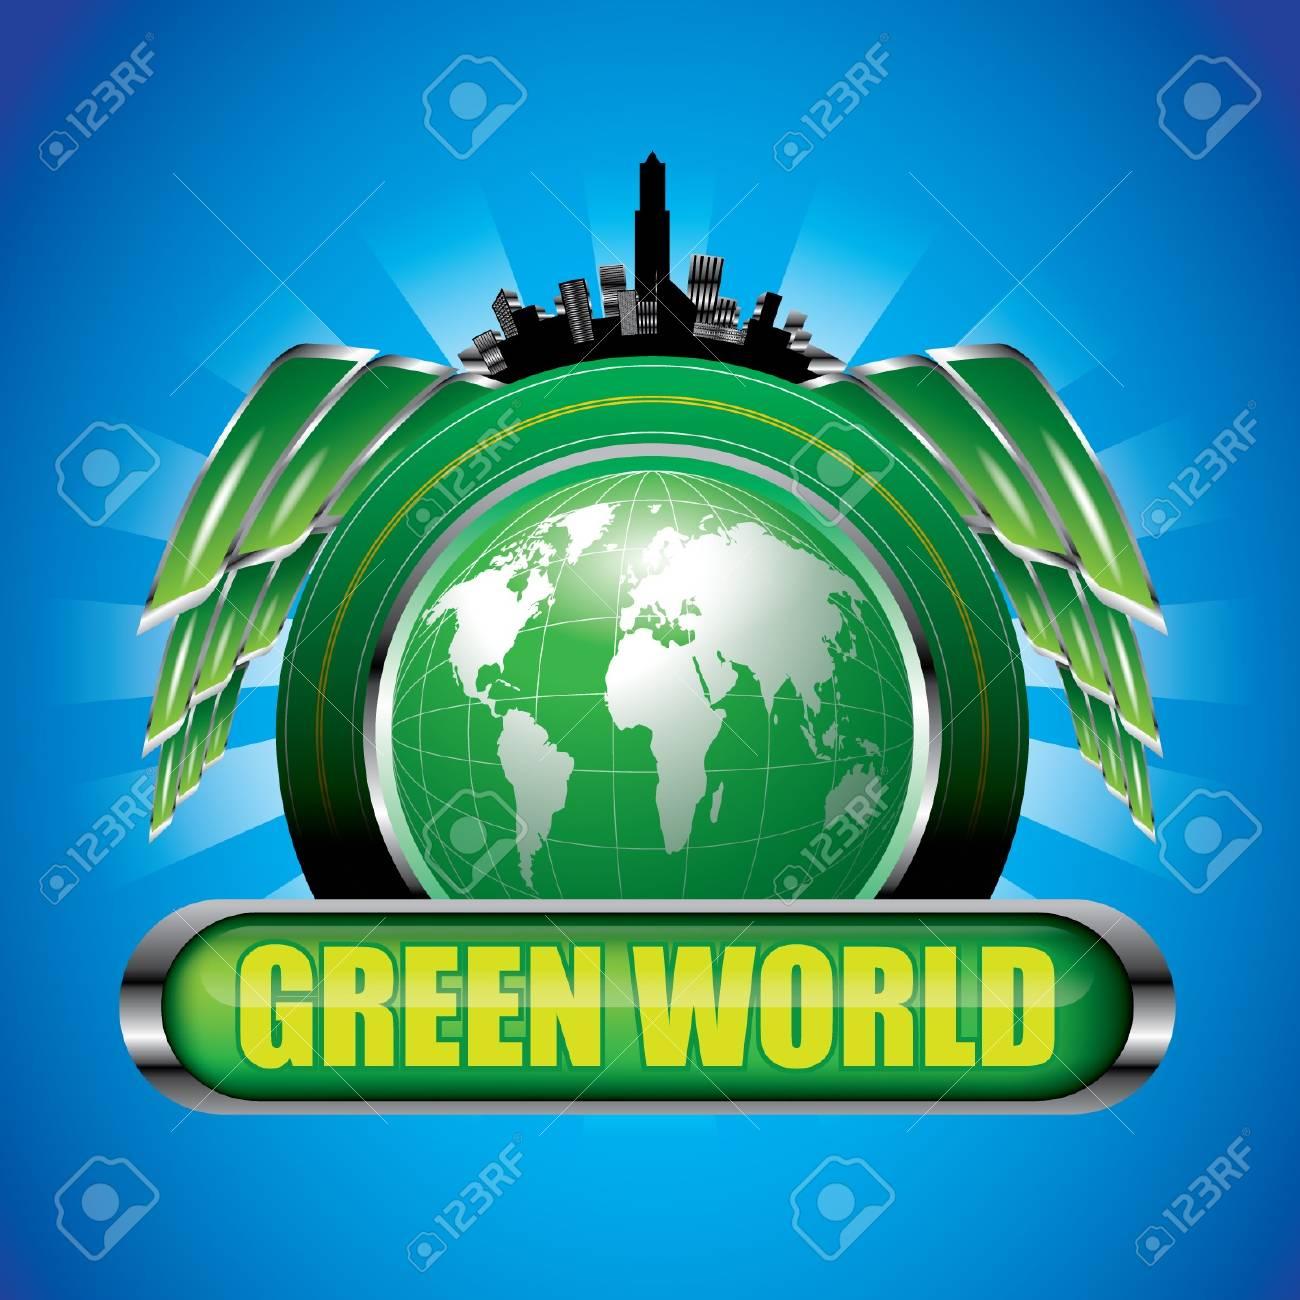 Green World Stock Vector - 12976316